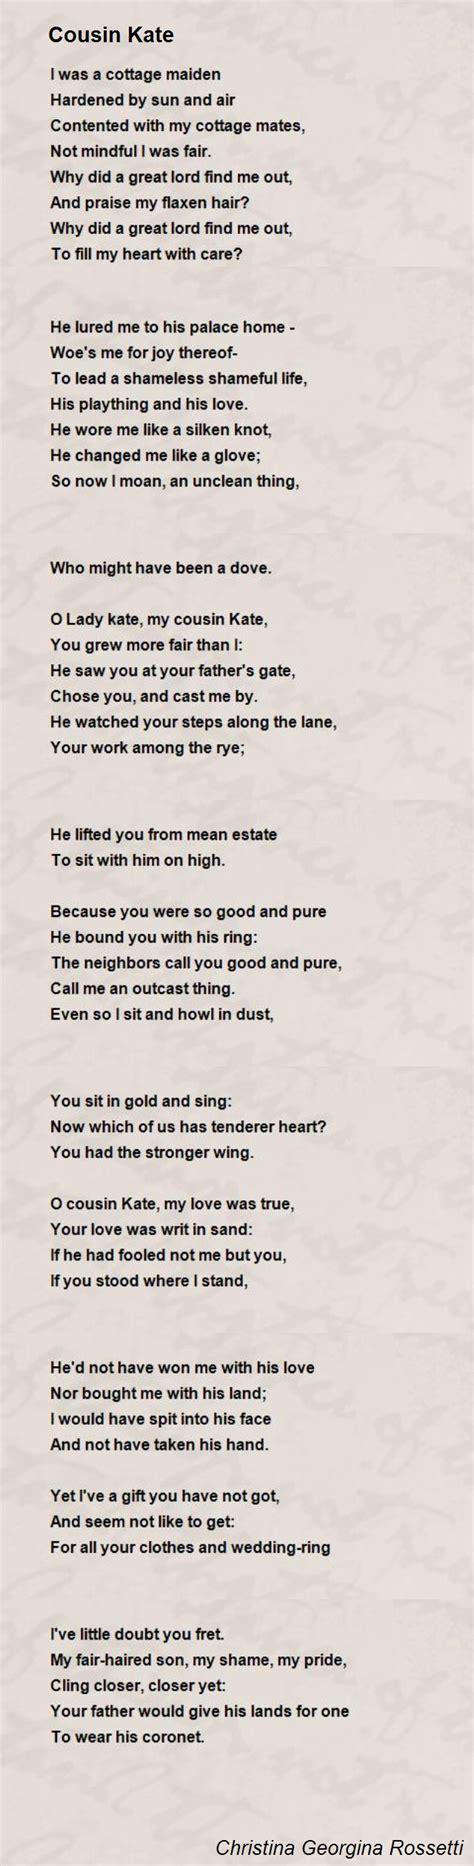 cousin kate poem  christina georgina rossetti poem hunter